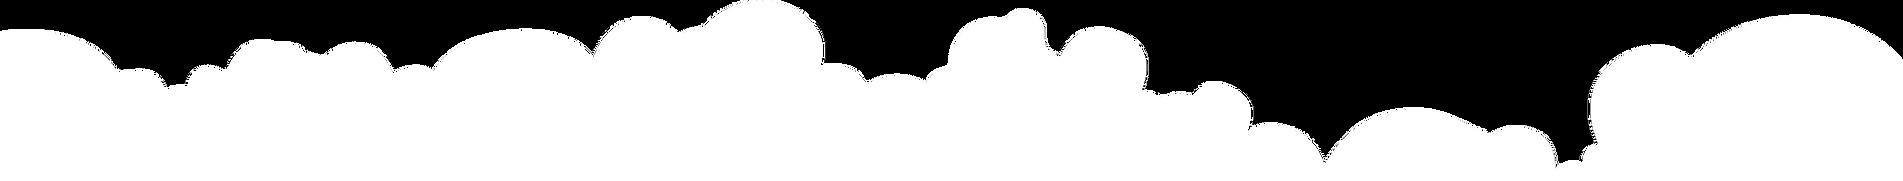 clouds-bg.png